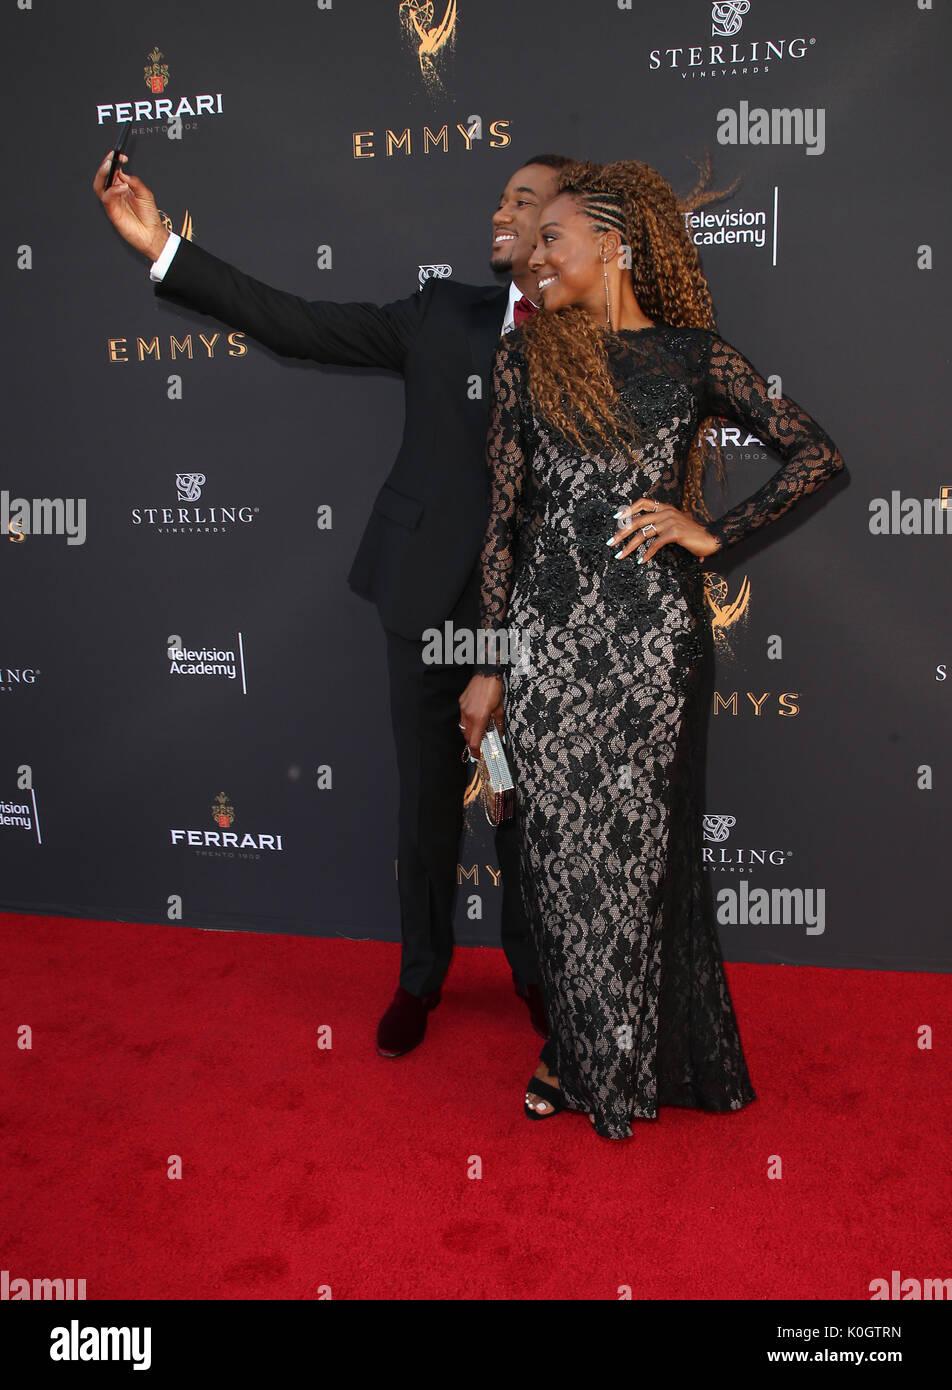 69e Emmy Awards de Los Angeles comprend: Jessie T. Usher, Erica Ash Où: Los Angeles, California, United States Quand: le 23 Juil 2017 Credit: FayesVision/WENN.com Banque D'Images